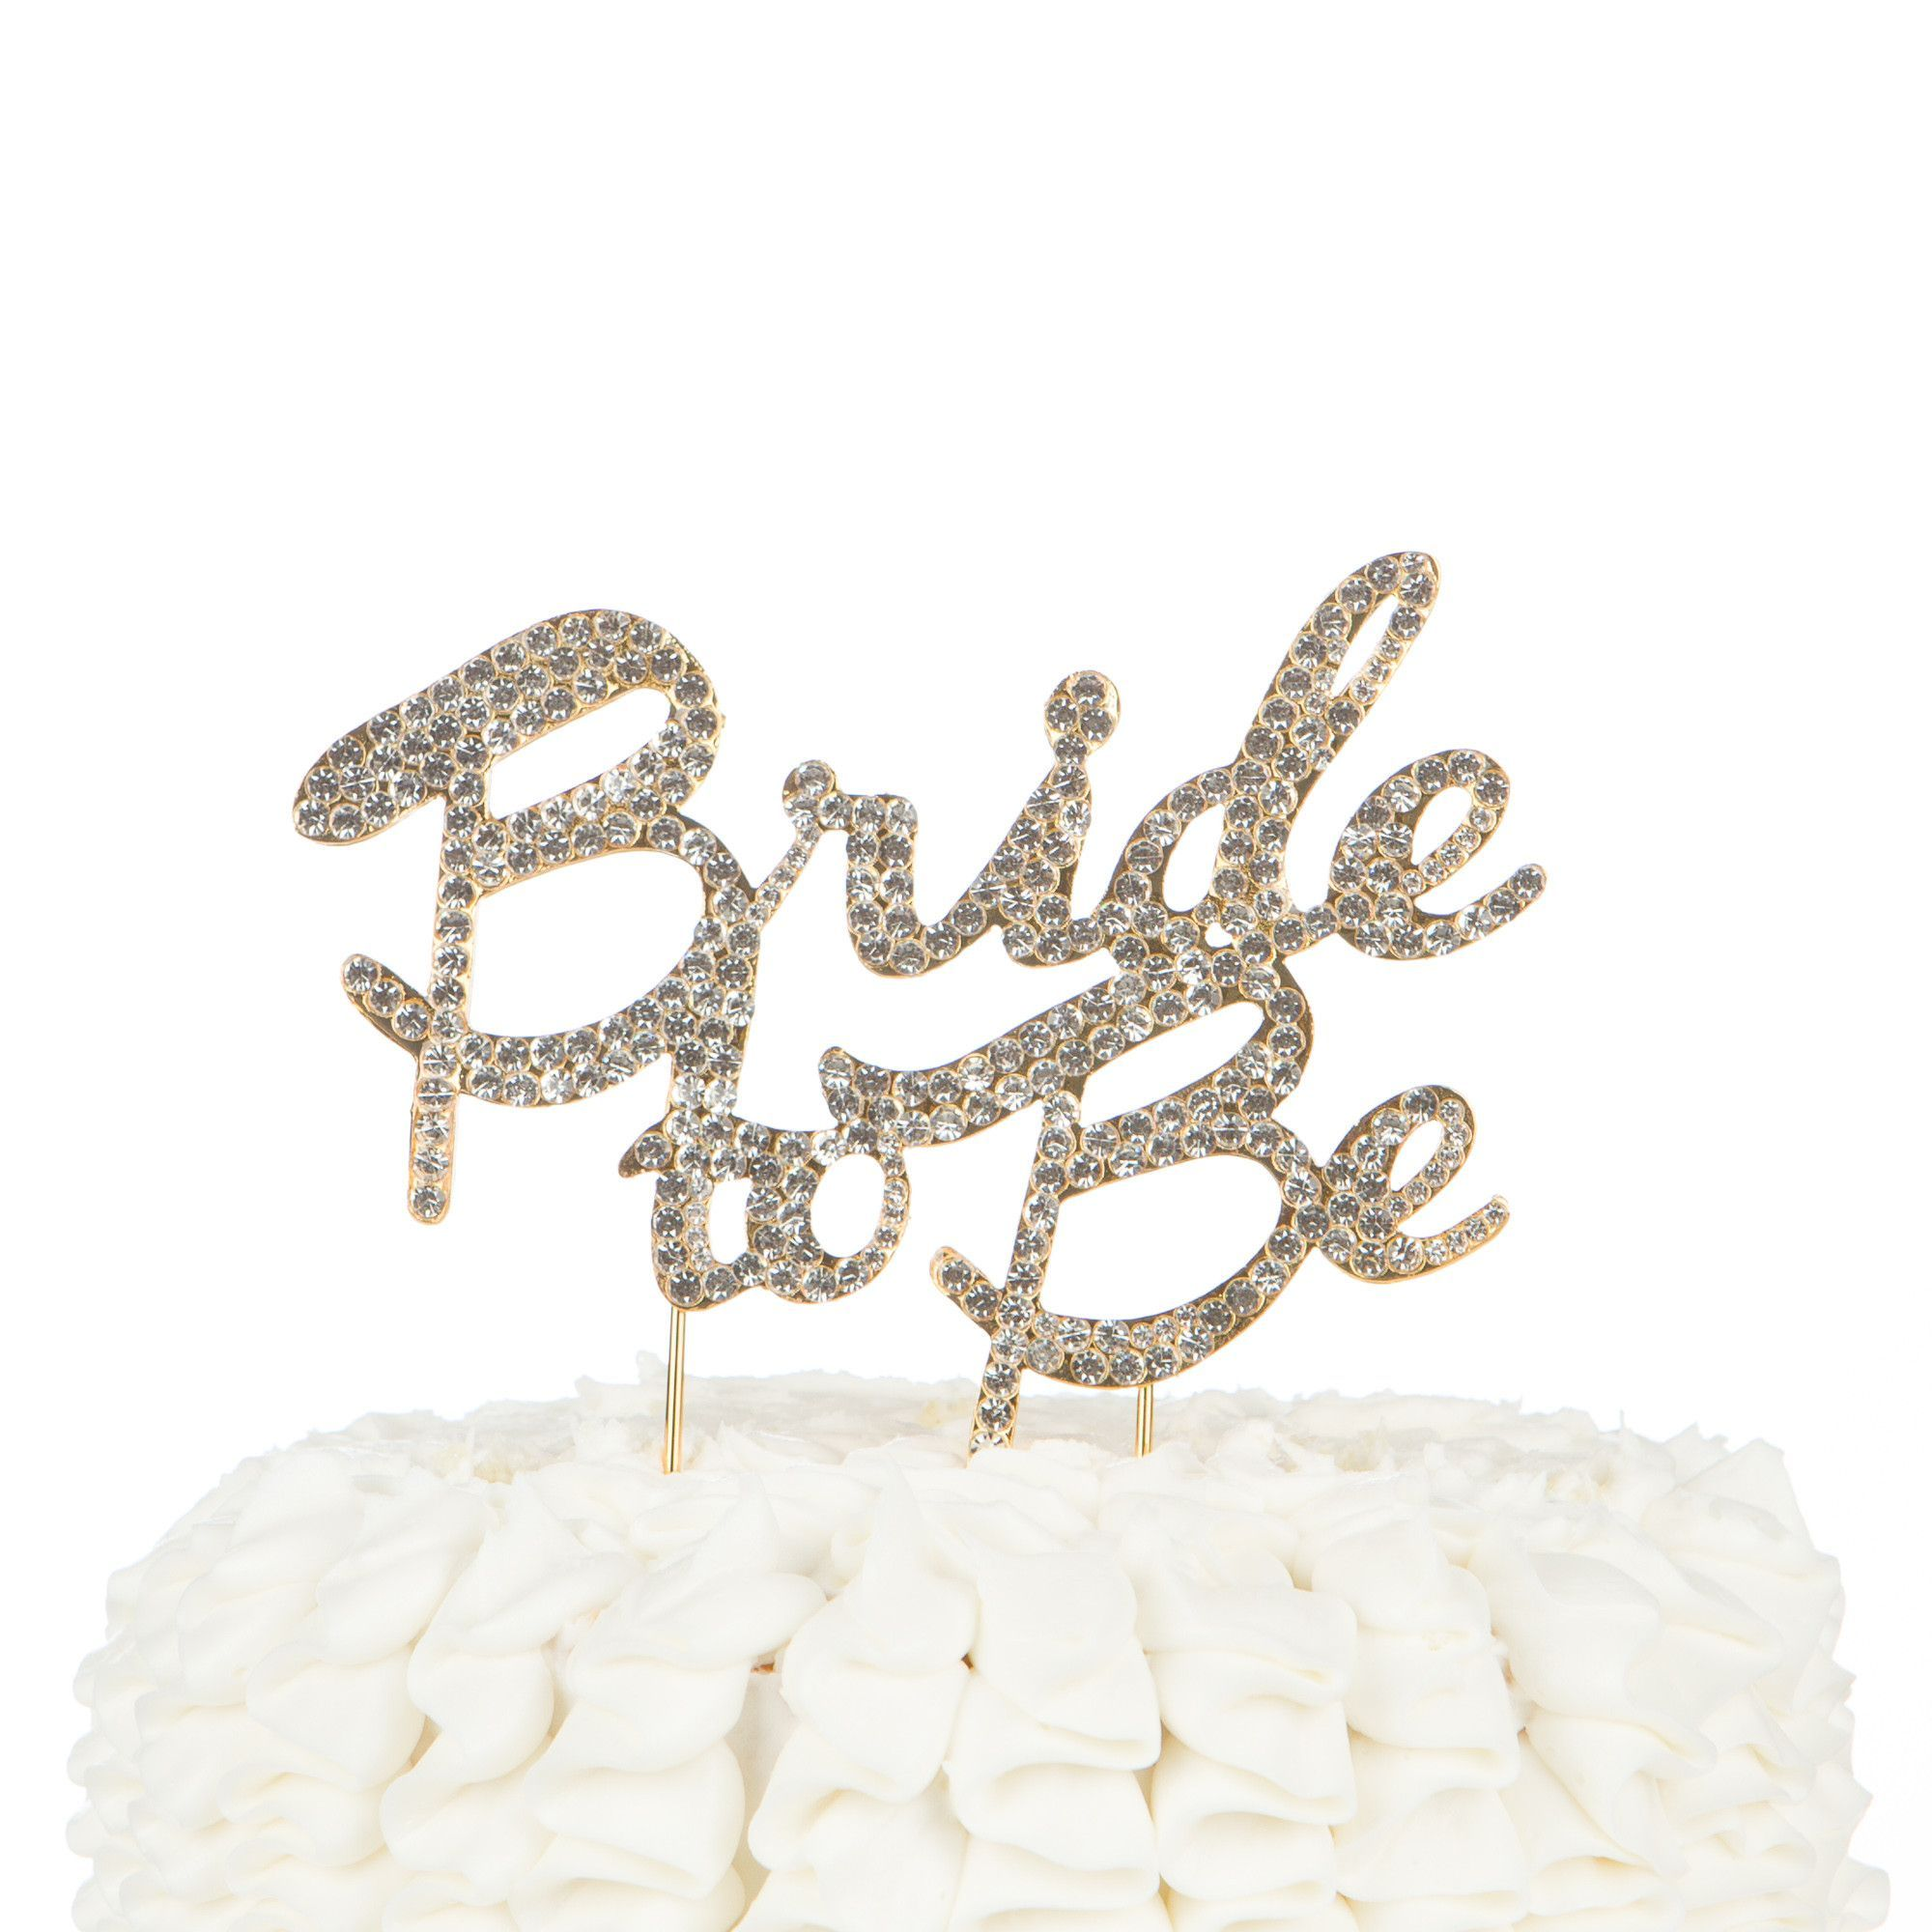 Ella celebration bride to be cake topper gold 1